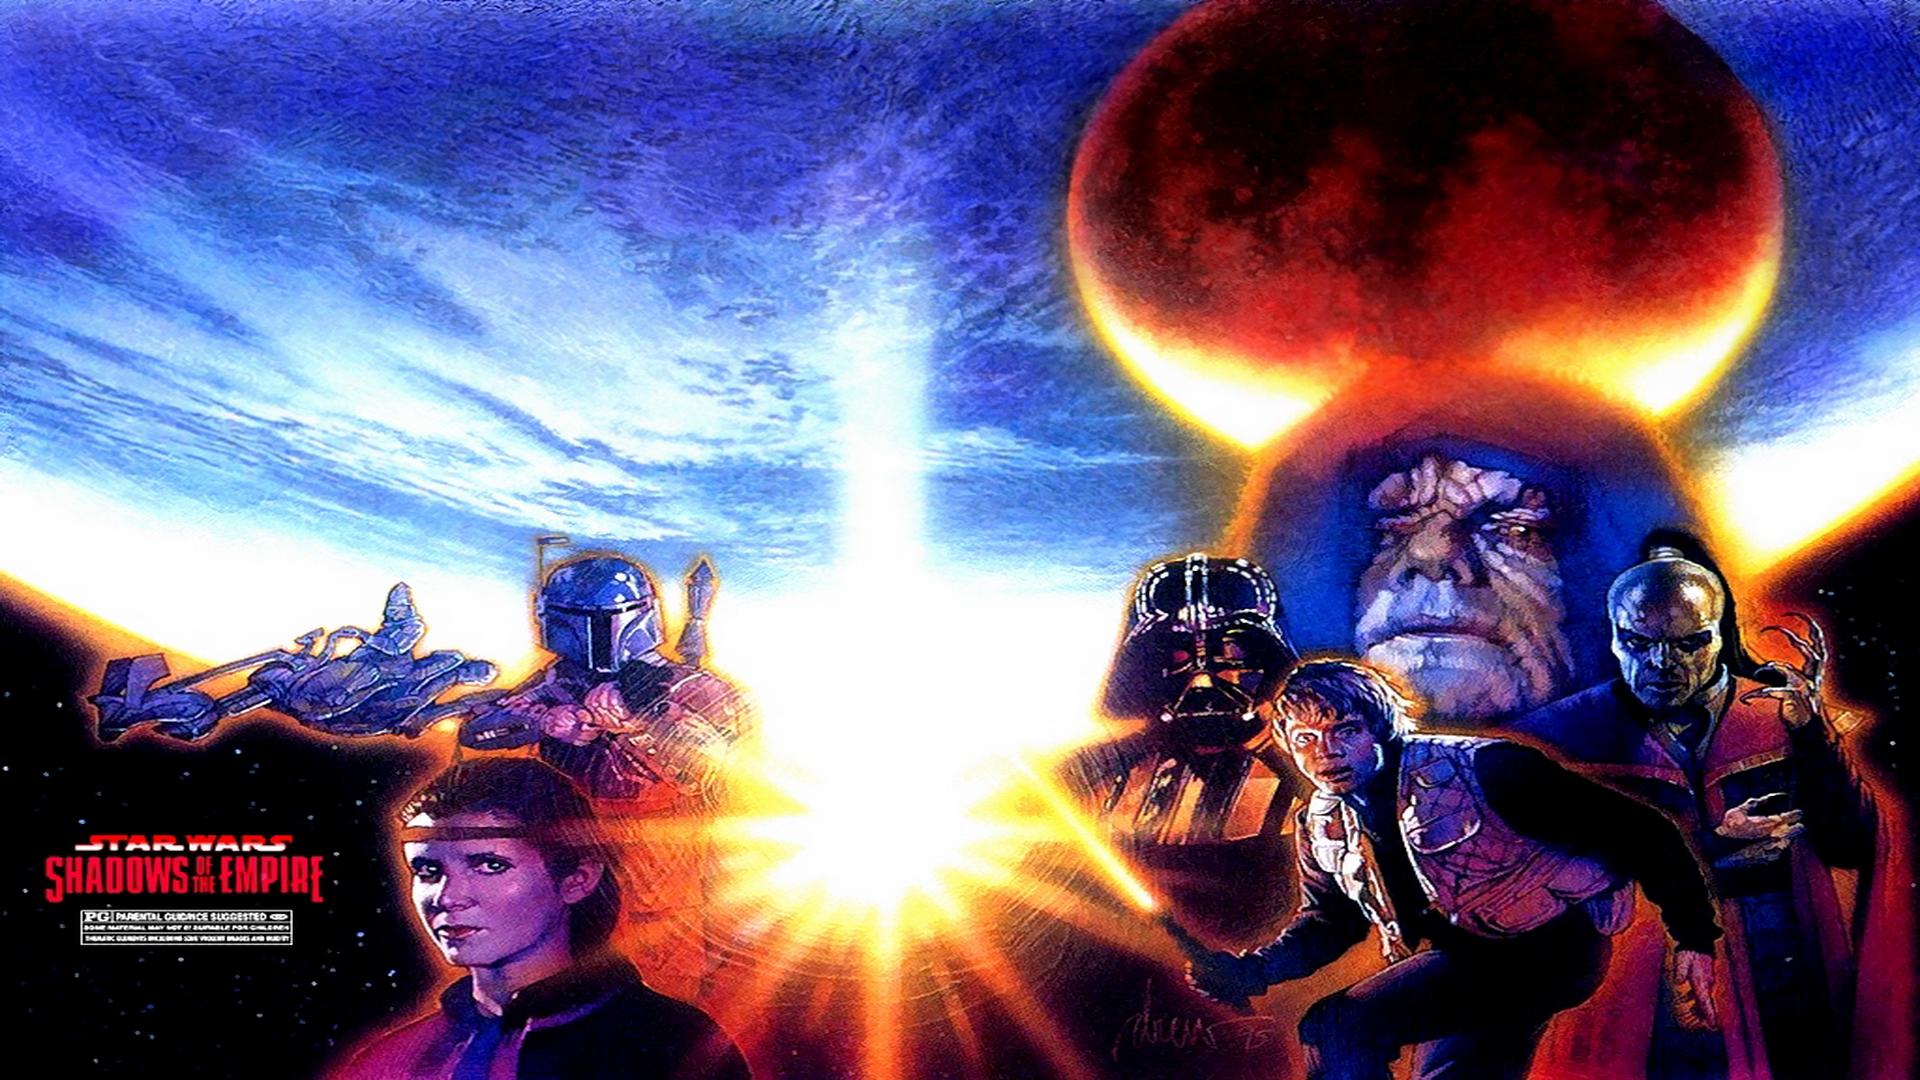 Star Wars Shadows Of The Empire Hd Wallpaper